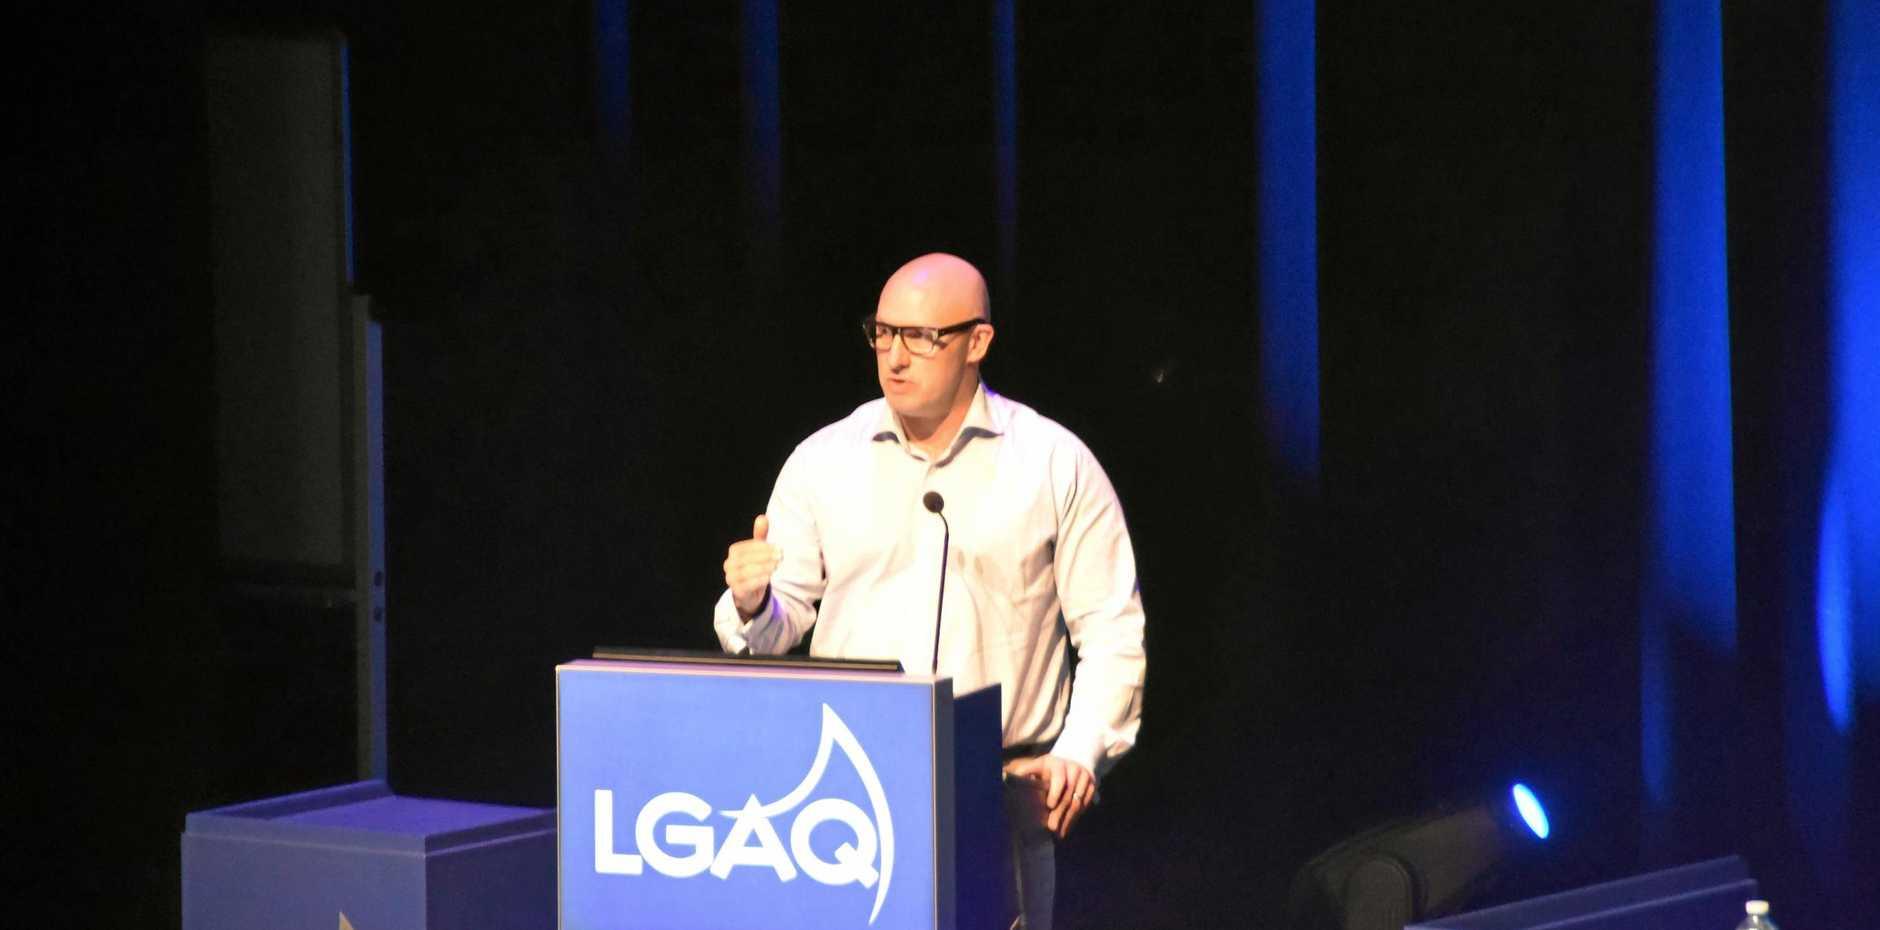 UK-based Accenture Global Cities segment lead Simon Giles spoke at the LGAQ conference.